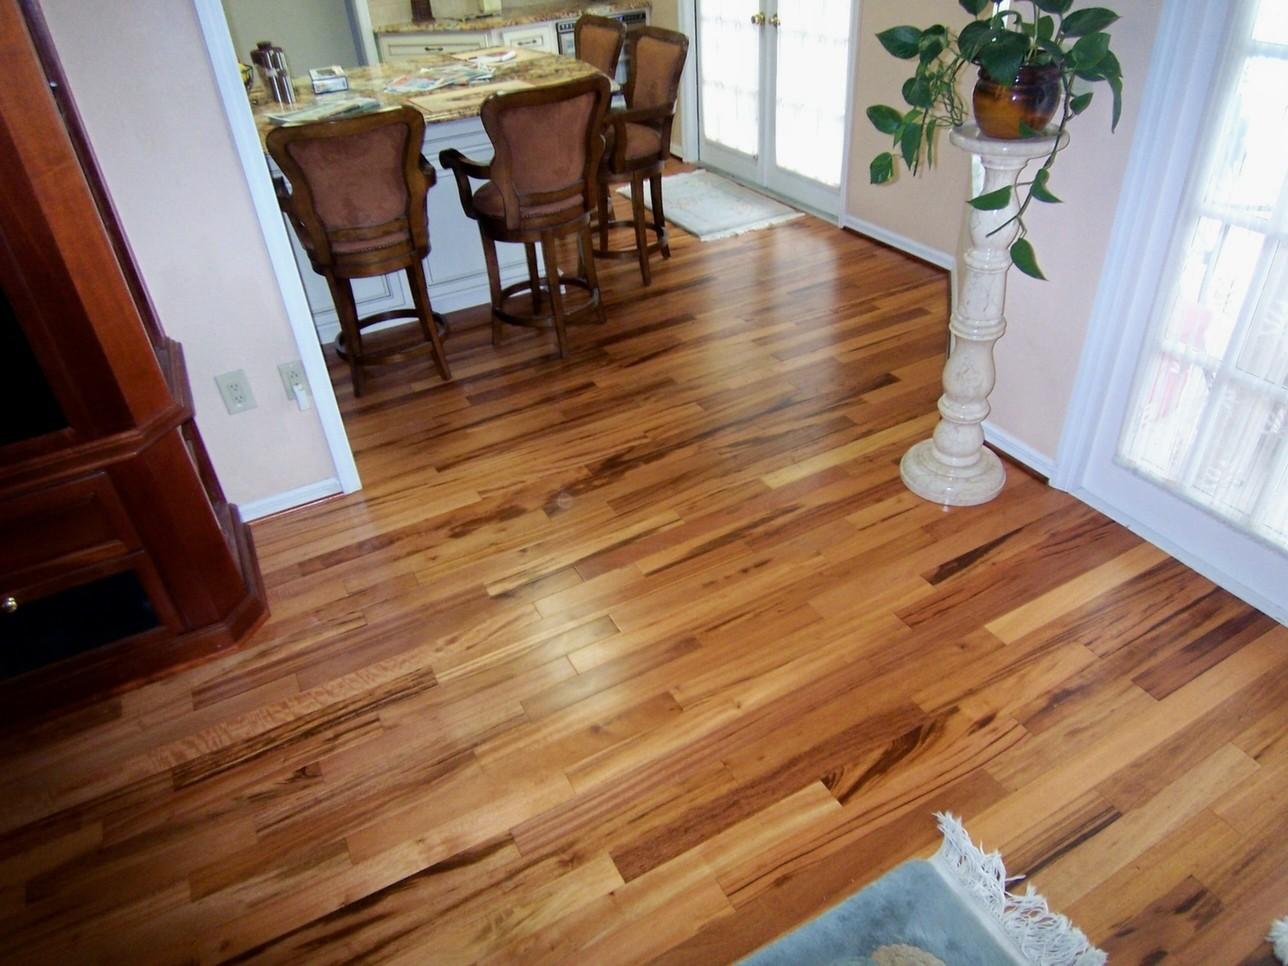 tiger wood hardwood flooring tigerwood hardwood flooring carpet vidalondon brazilian koa hardwood  flooring BSMAIMW